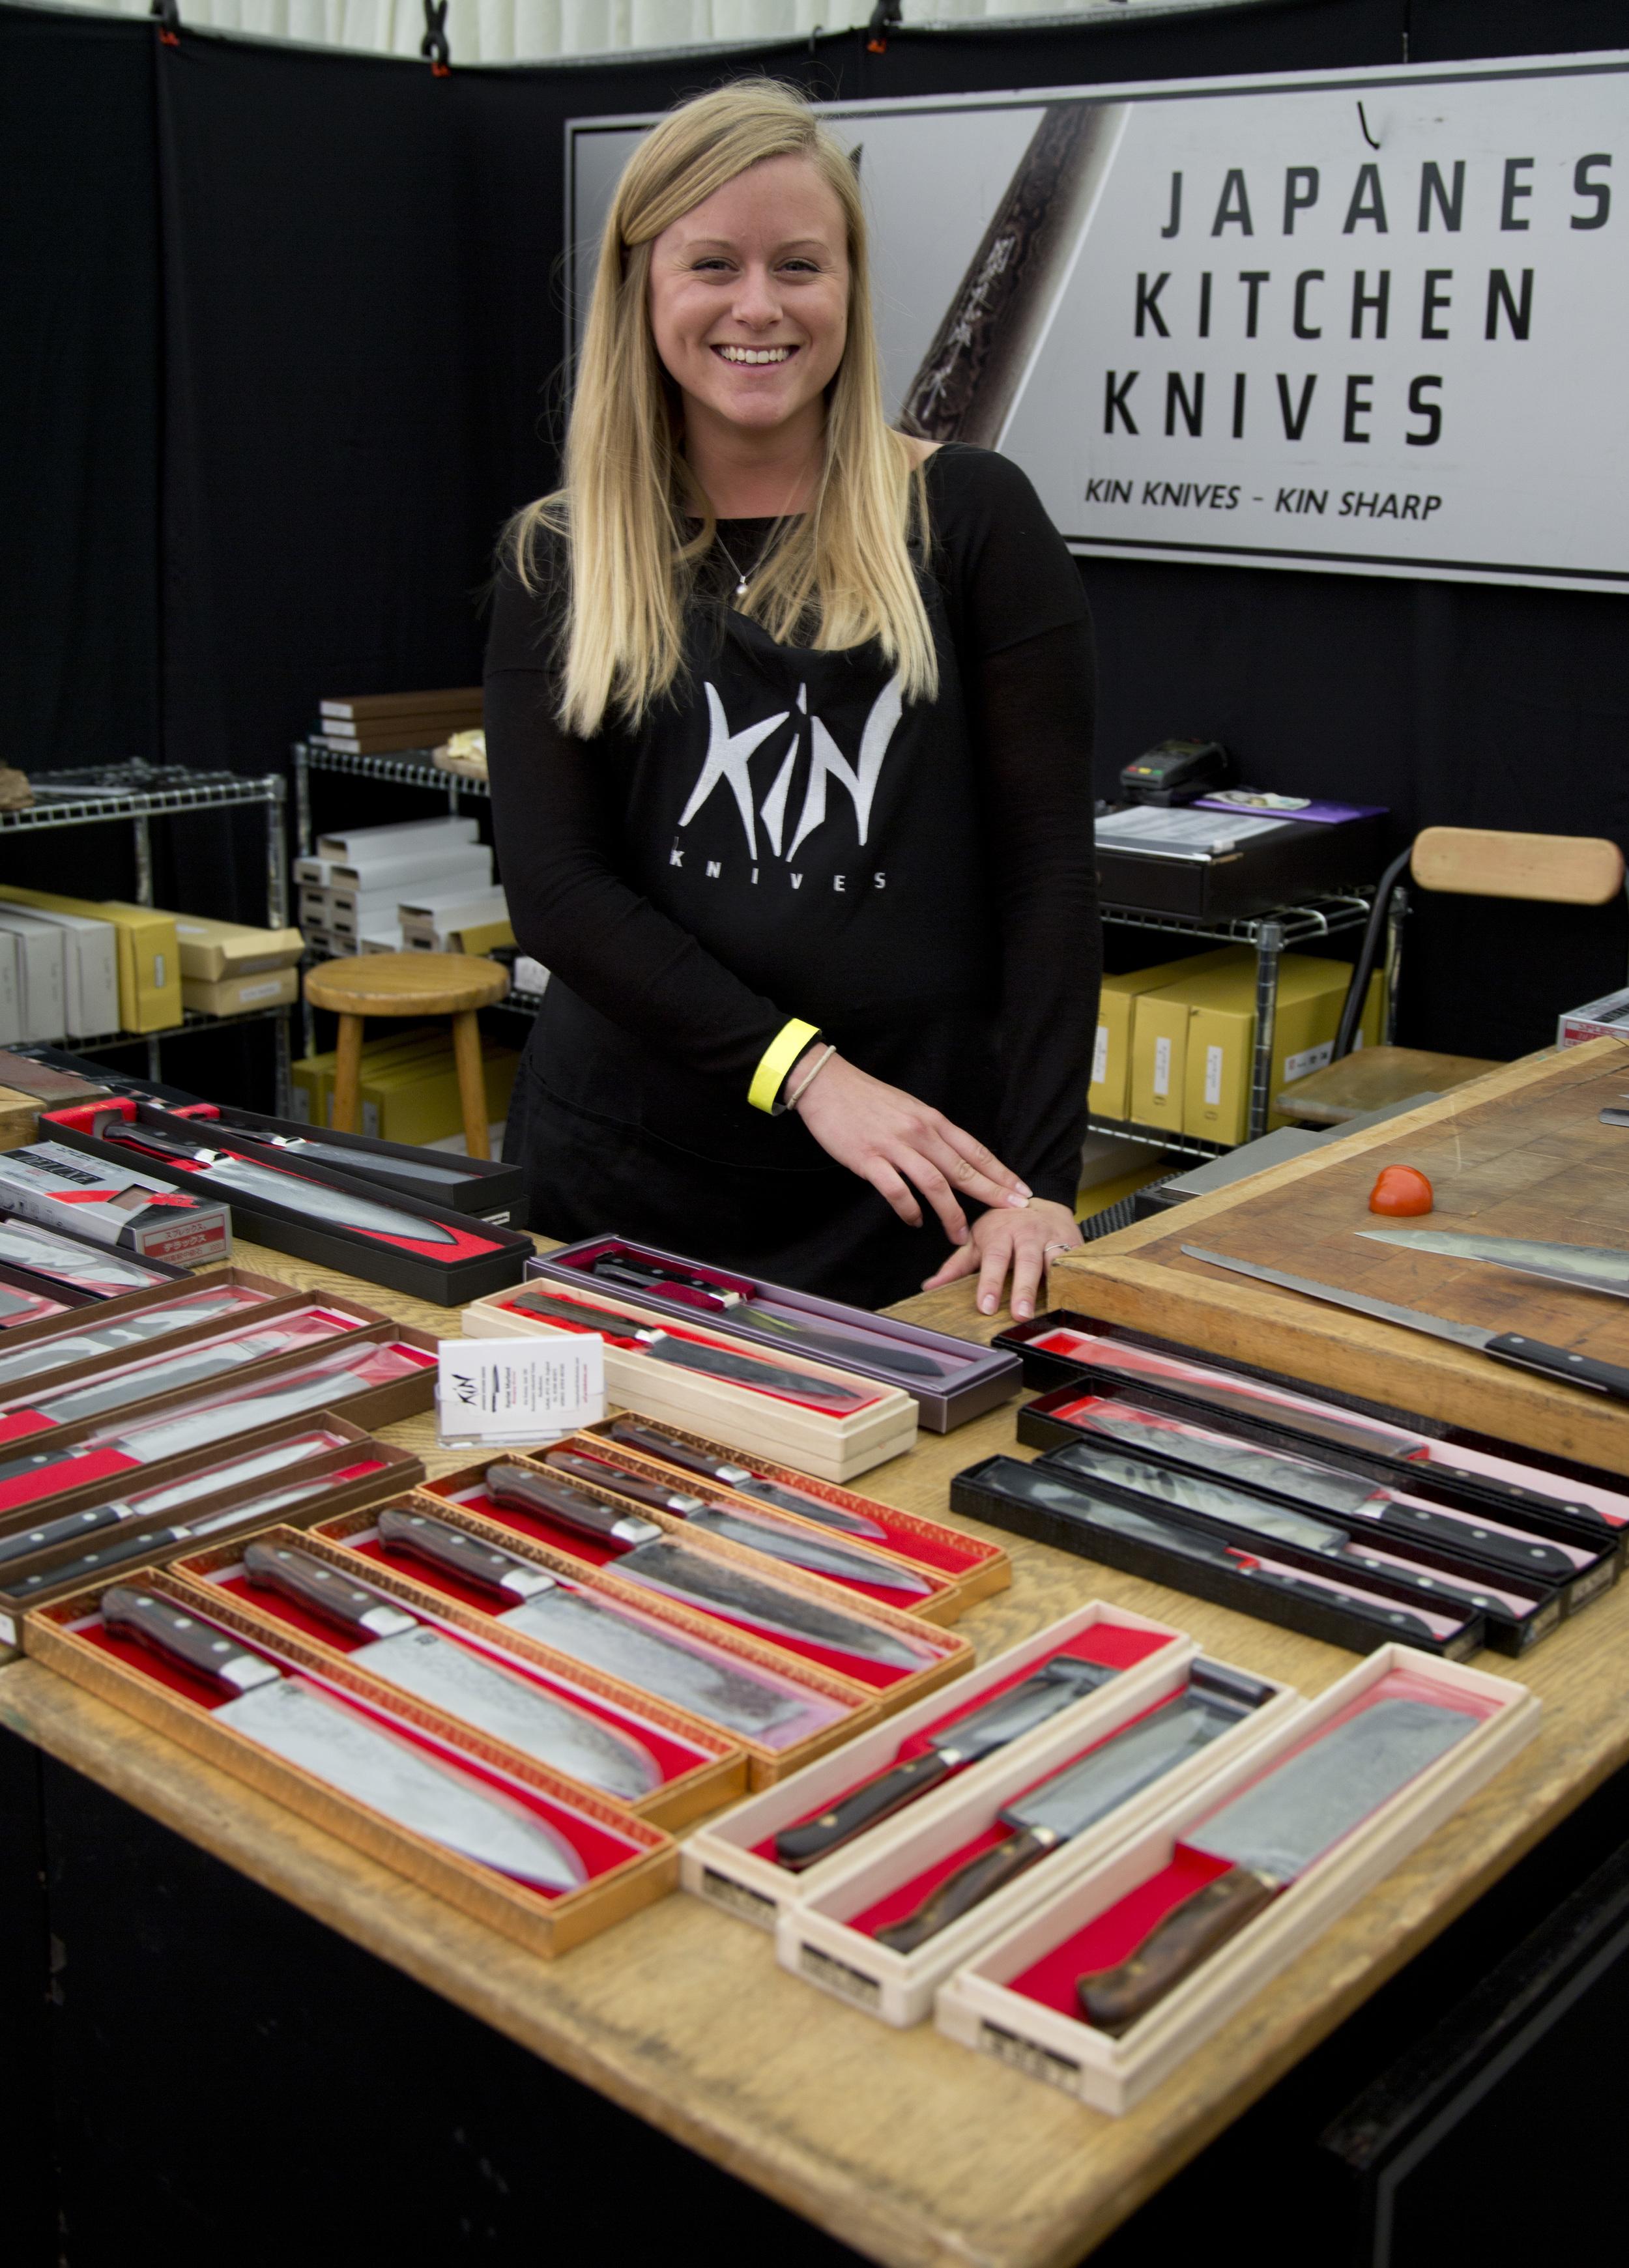 © Domenic Pendino: Kin Japanese Kitchen Knives